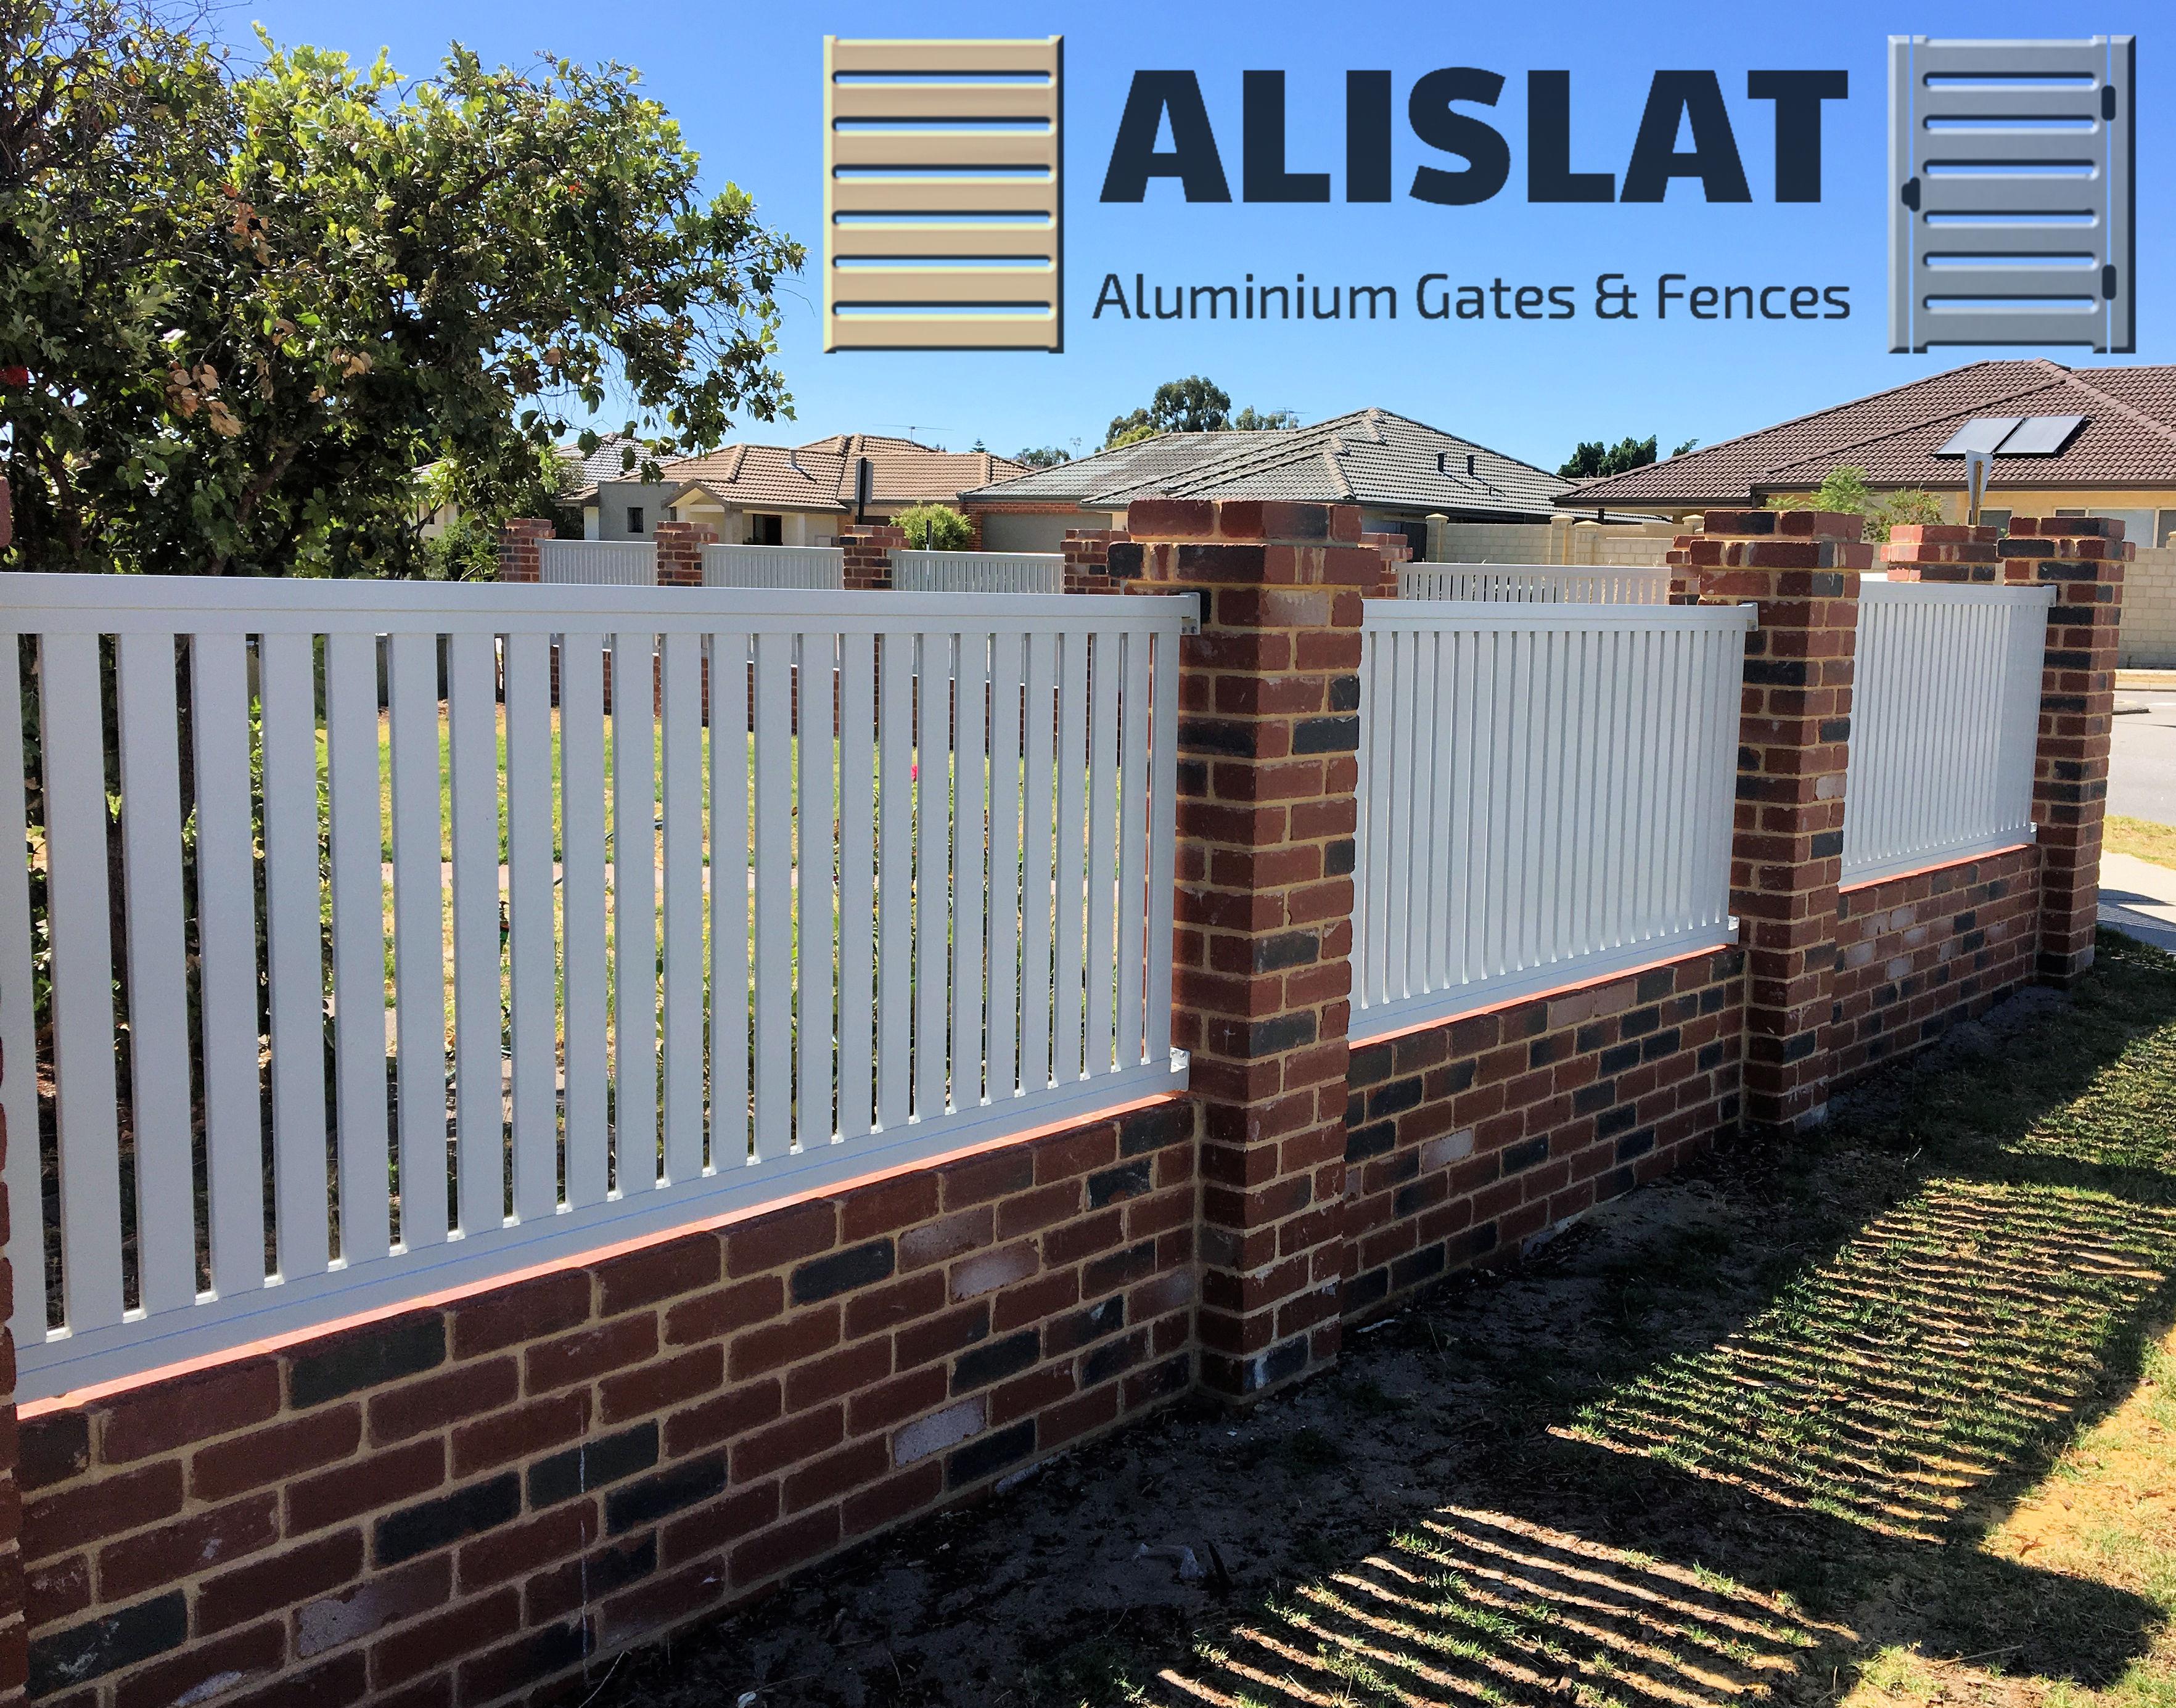 Alislat Vertical Slat Fencing & Gates 6